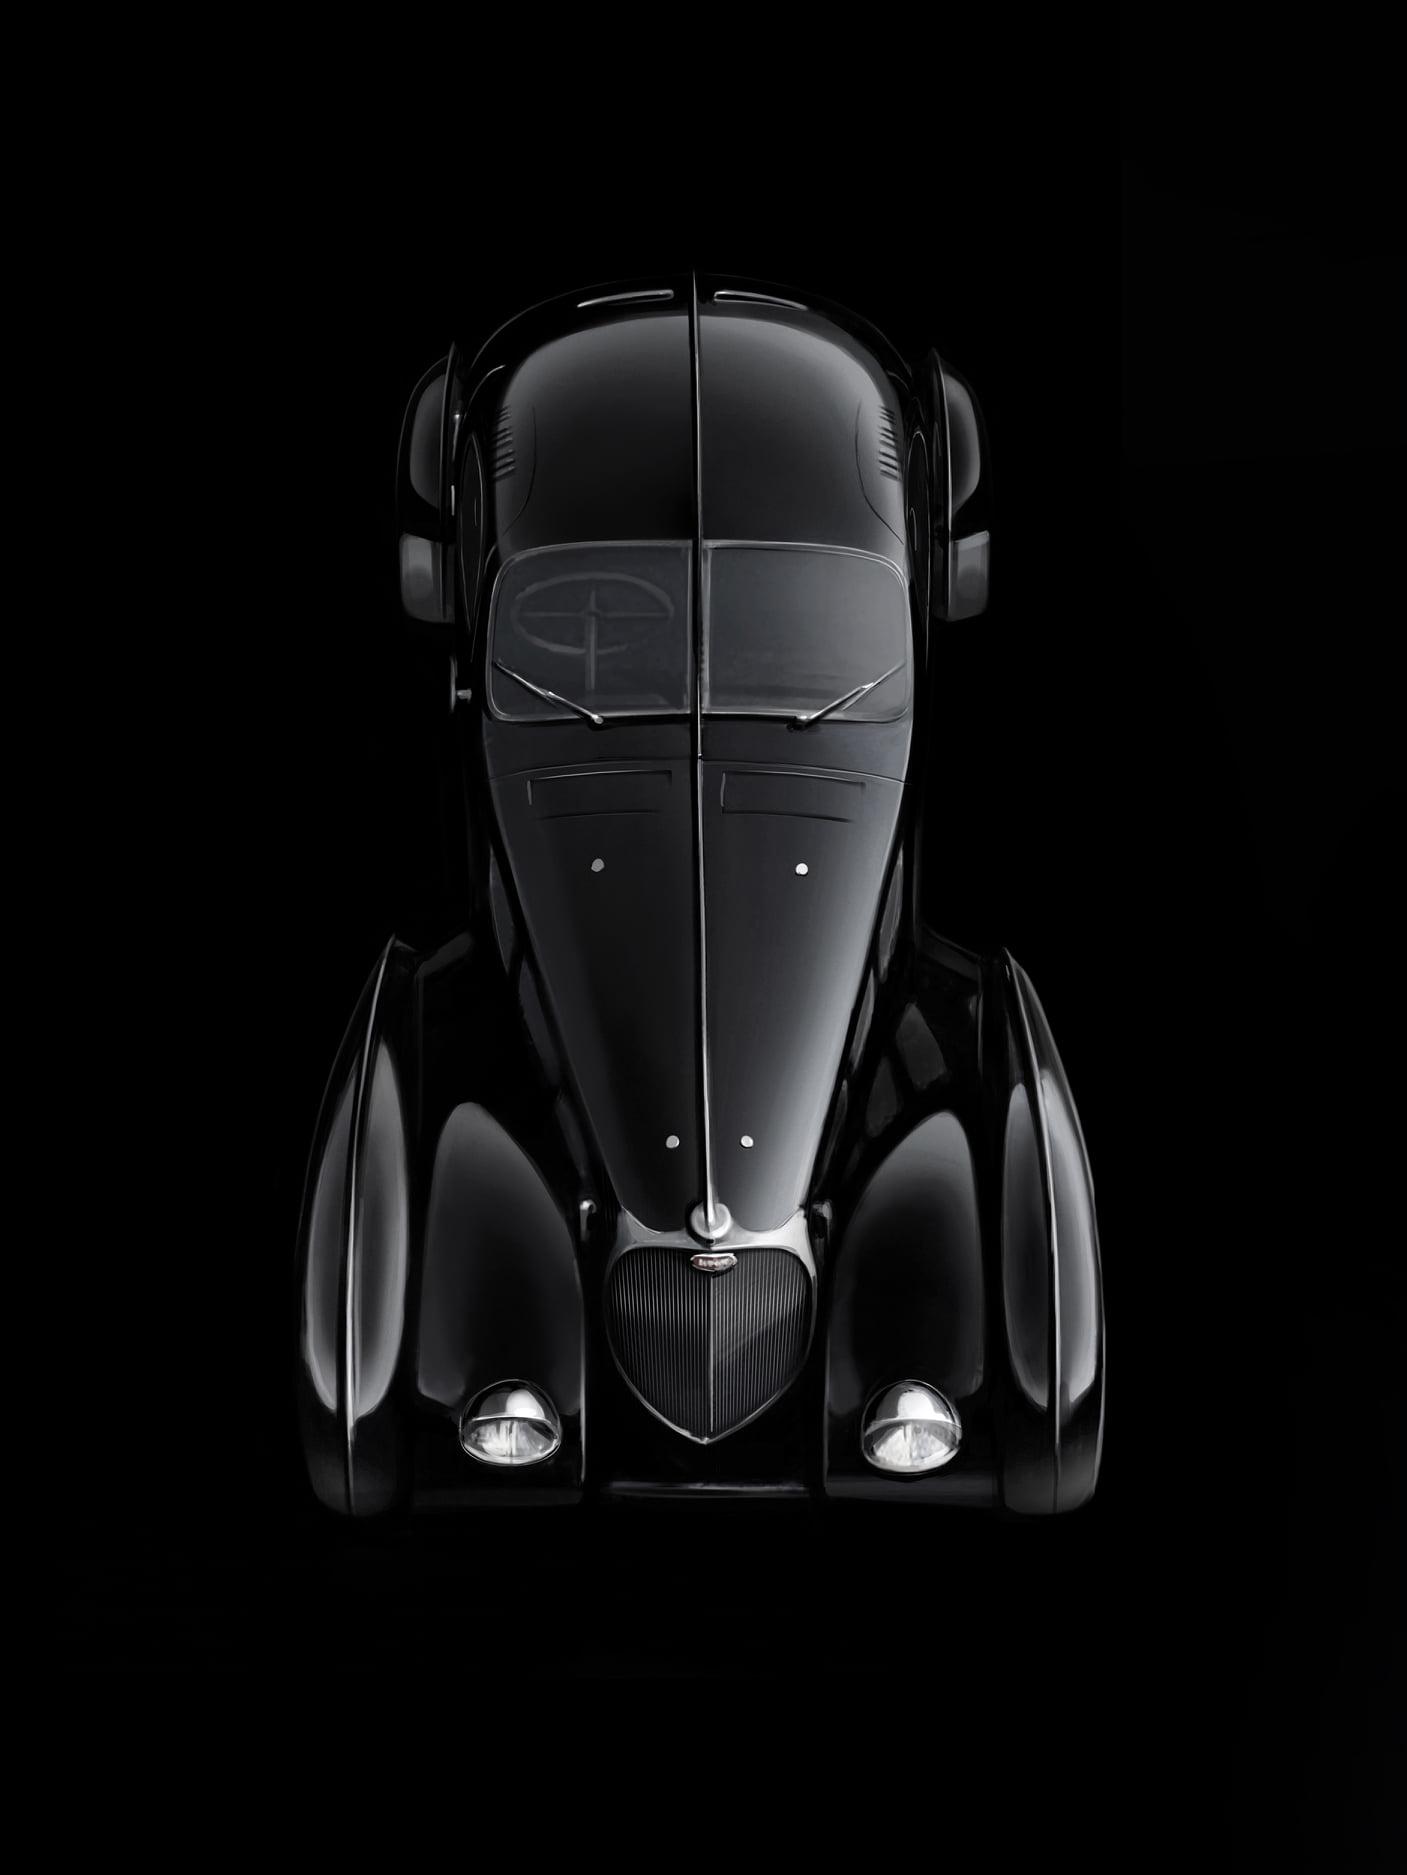 Type 57 SC Atlantic Bugatti